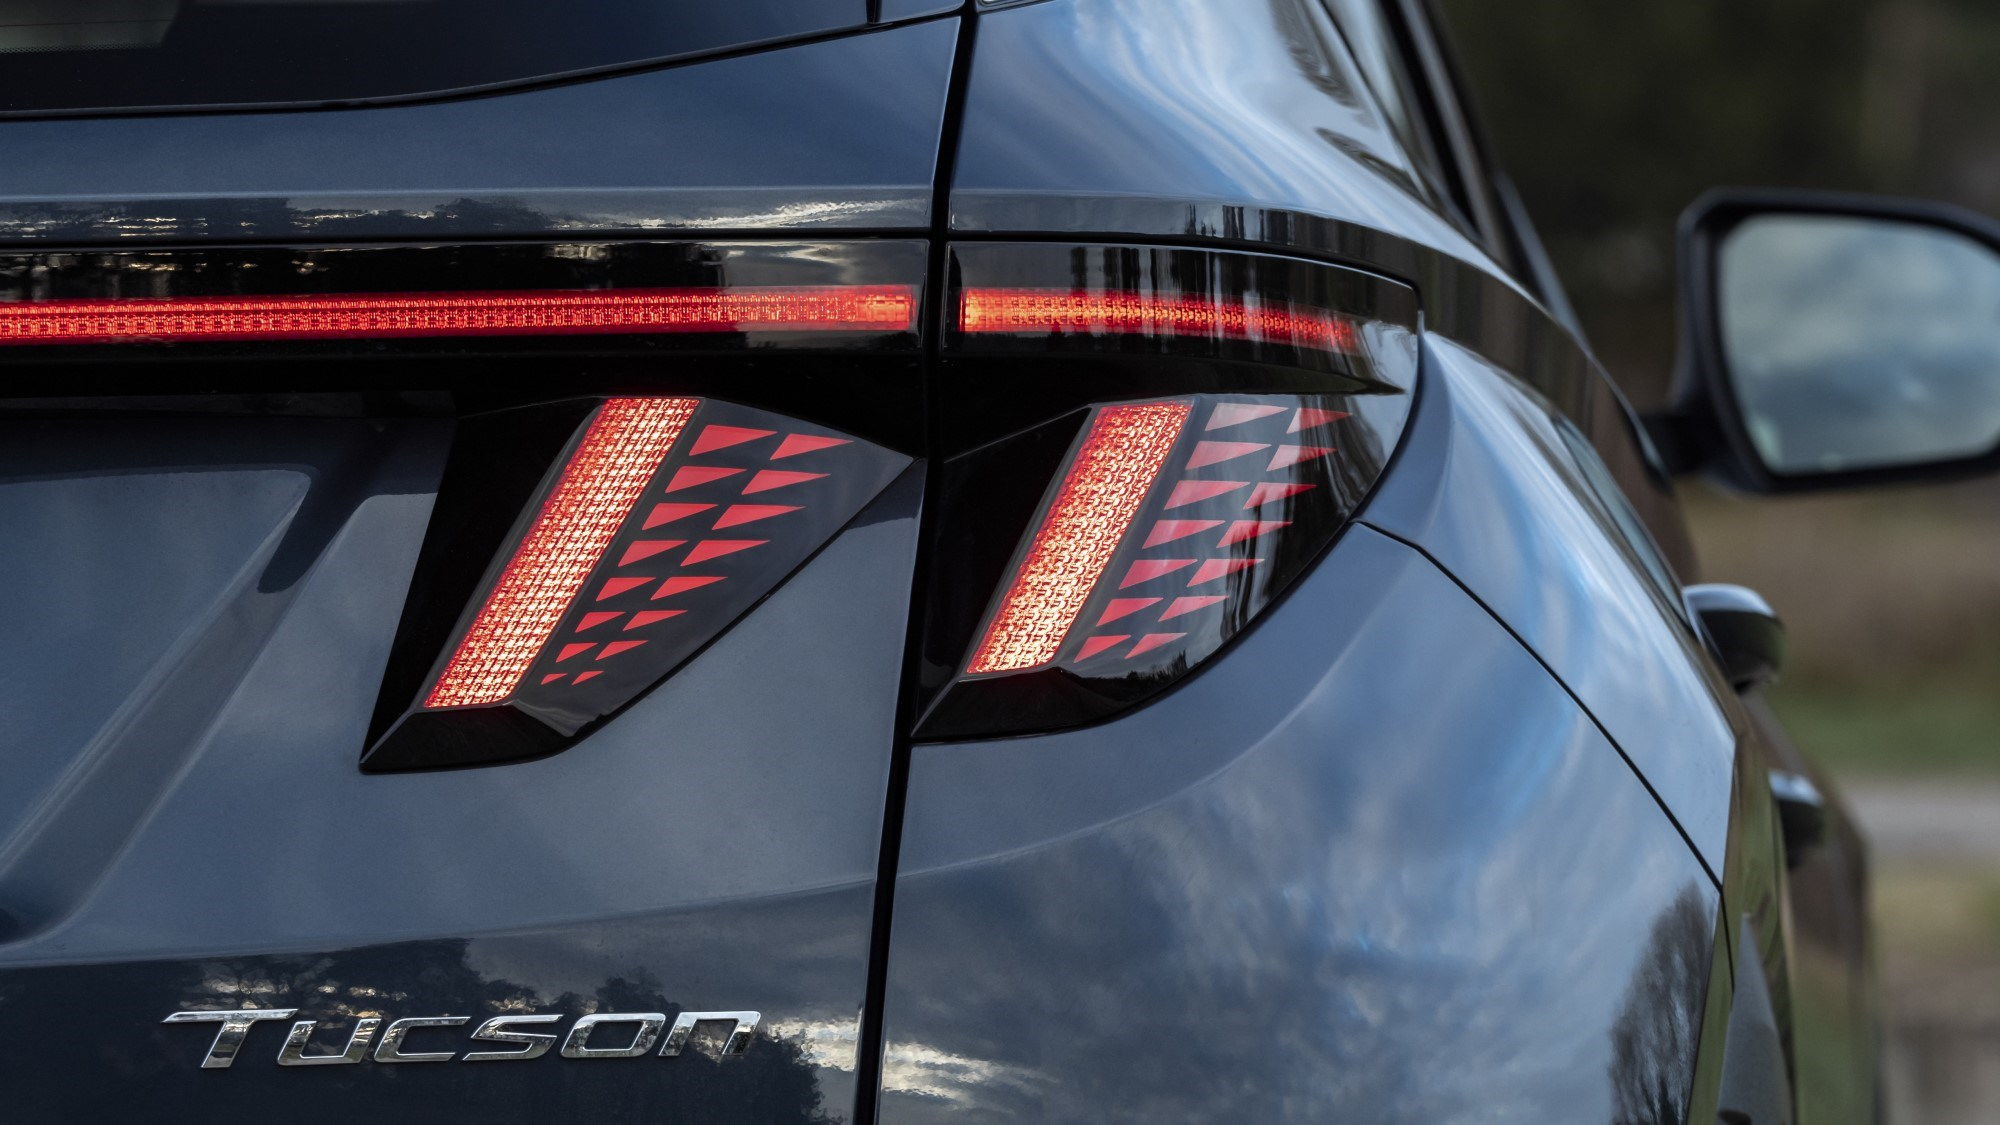 tucson rear light